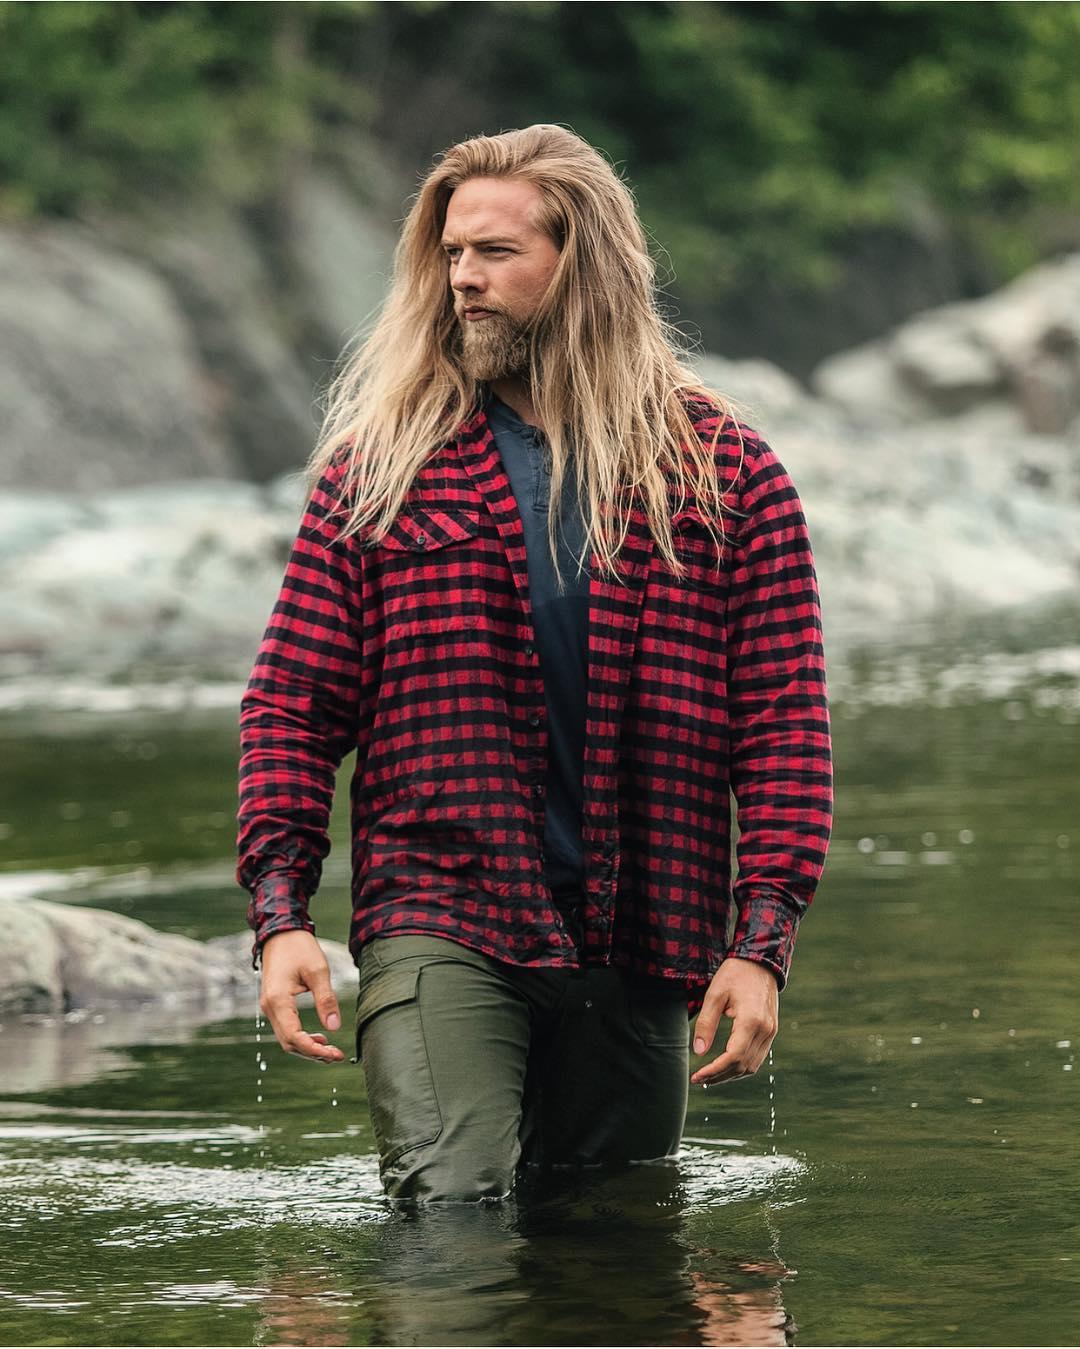 barba 2017, cabelo longo masculino, cabelo loiro, homem estiloso, tenente da marinha, moda sem censura, alex cursino, estilo viking, lumberssexual, mens, grooming, (9)